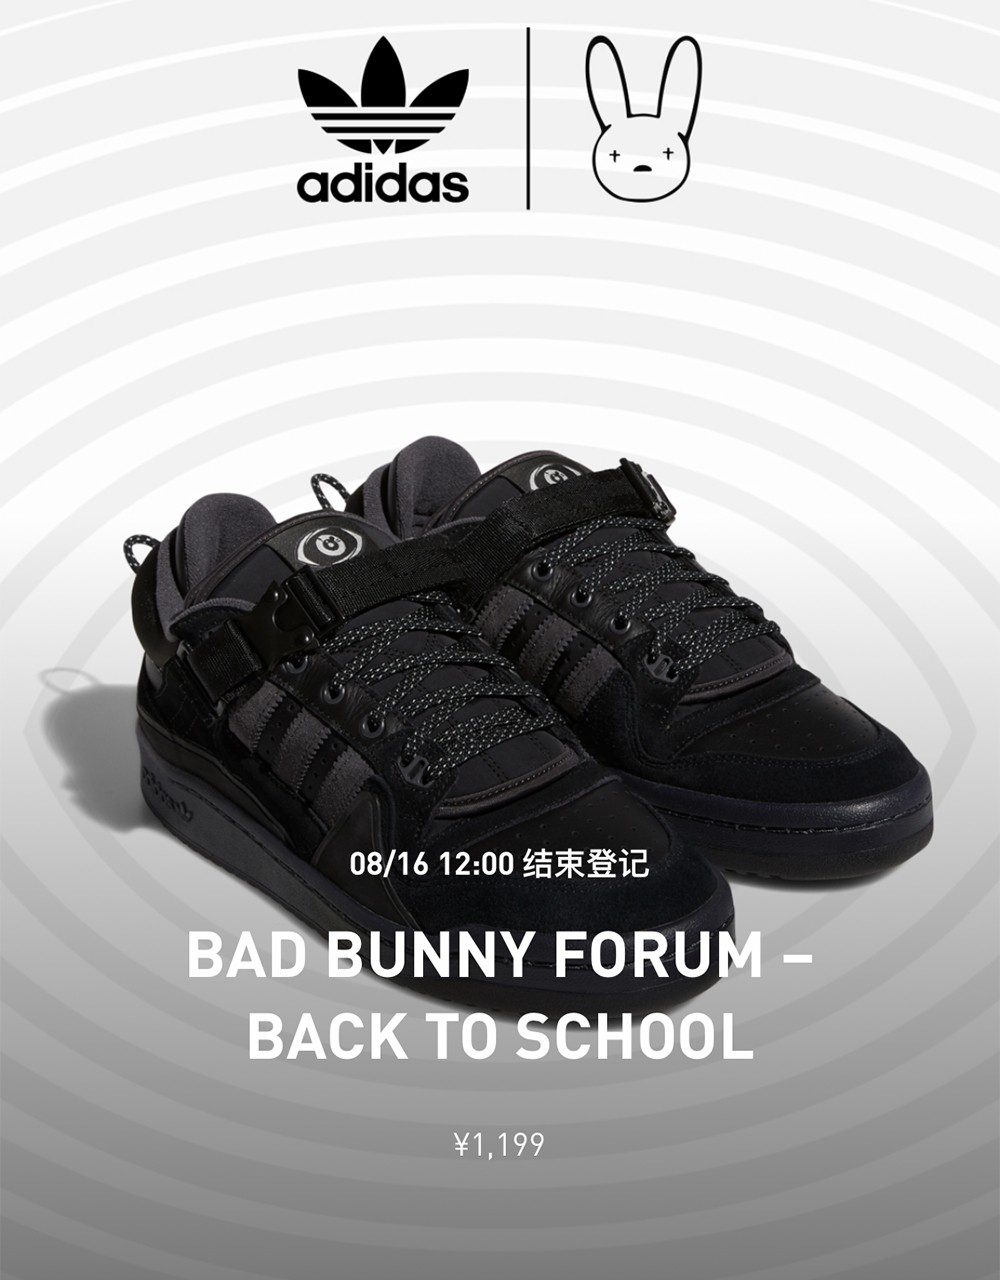 Bad Bunny,adidas,Forum Buckle  上一双市价小 3K!全新 Bad Bunny x adidas 刚刚开始登记!